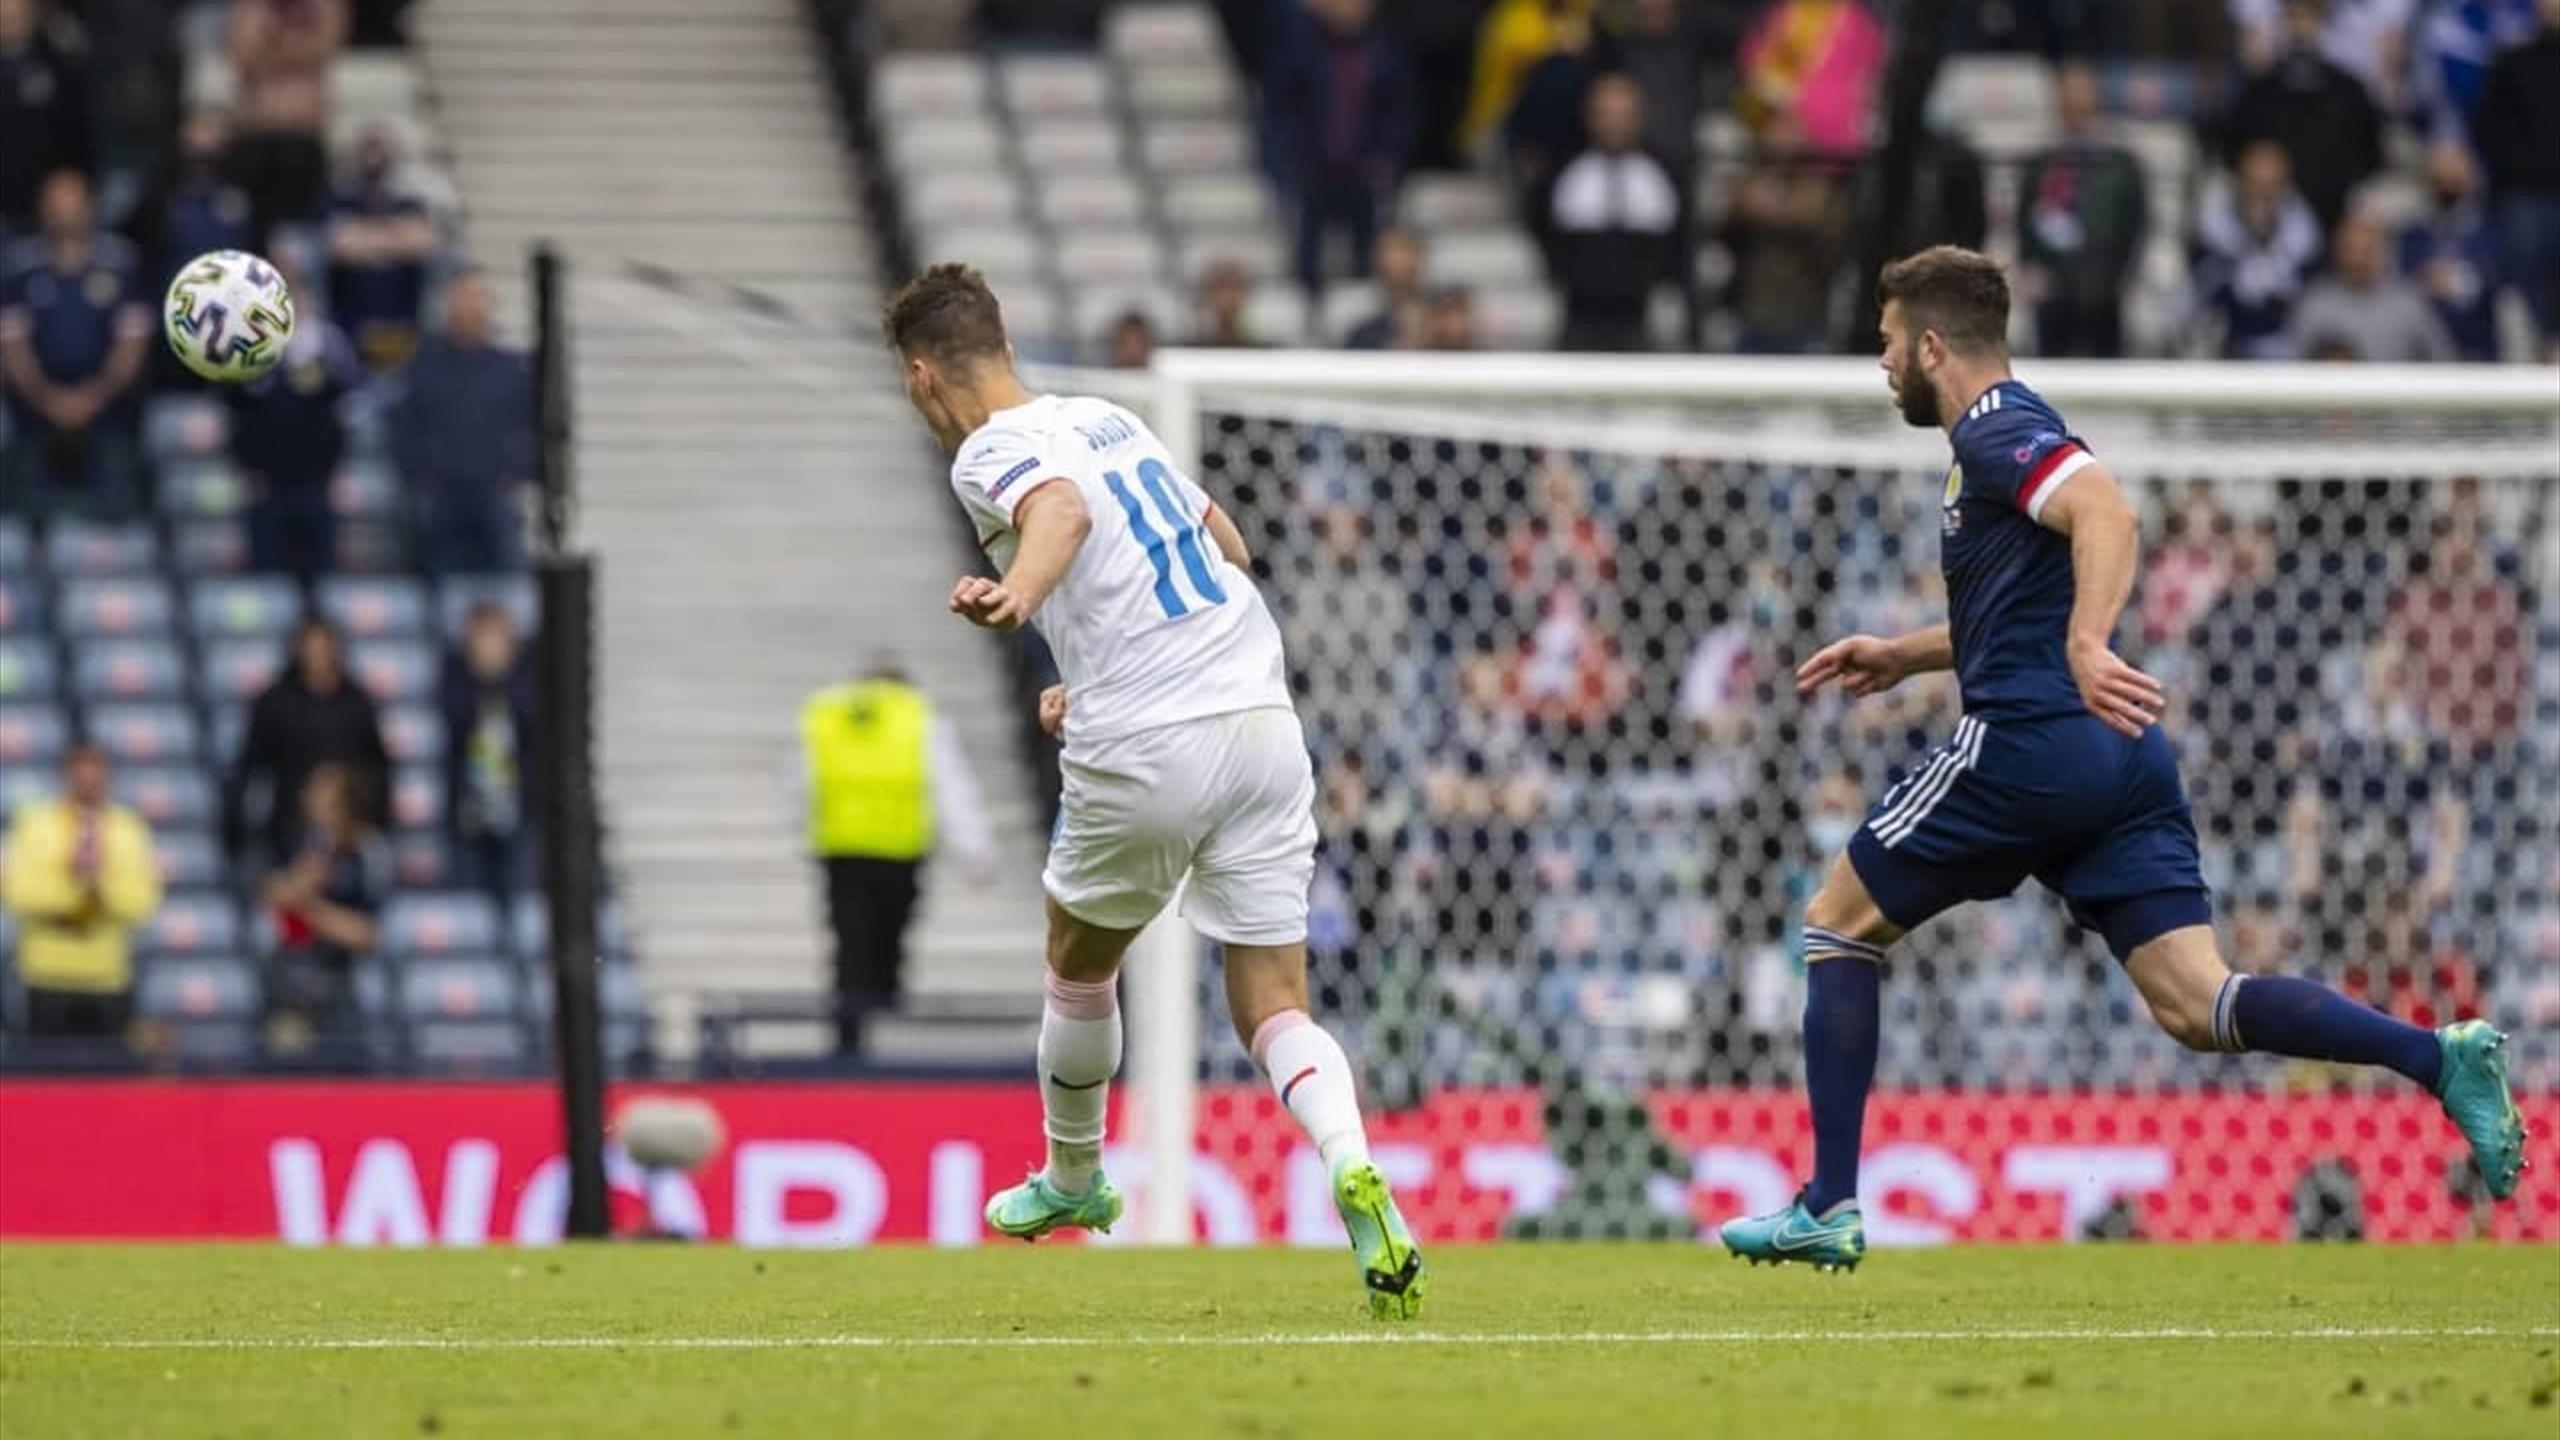 Euro 2020 - 'It's absurdly difficult to do' - Patrik Schick's wonder goal v  Scotland praised - Football video - Eurosport